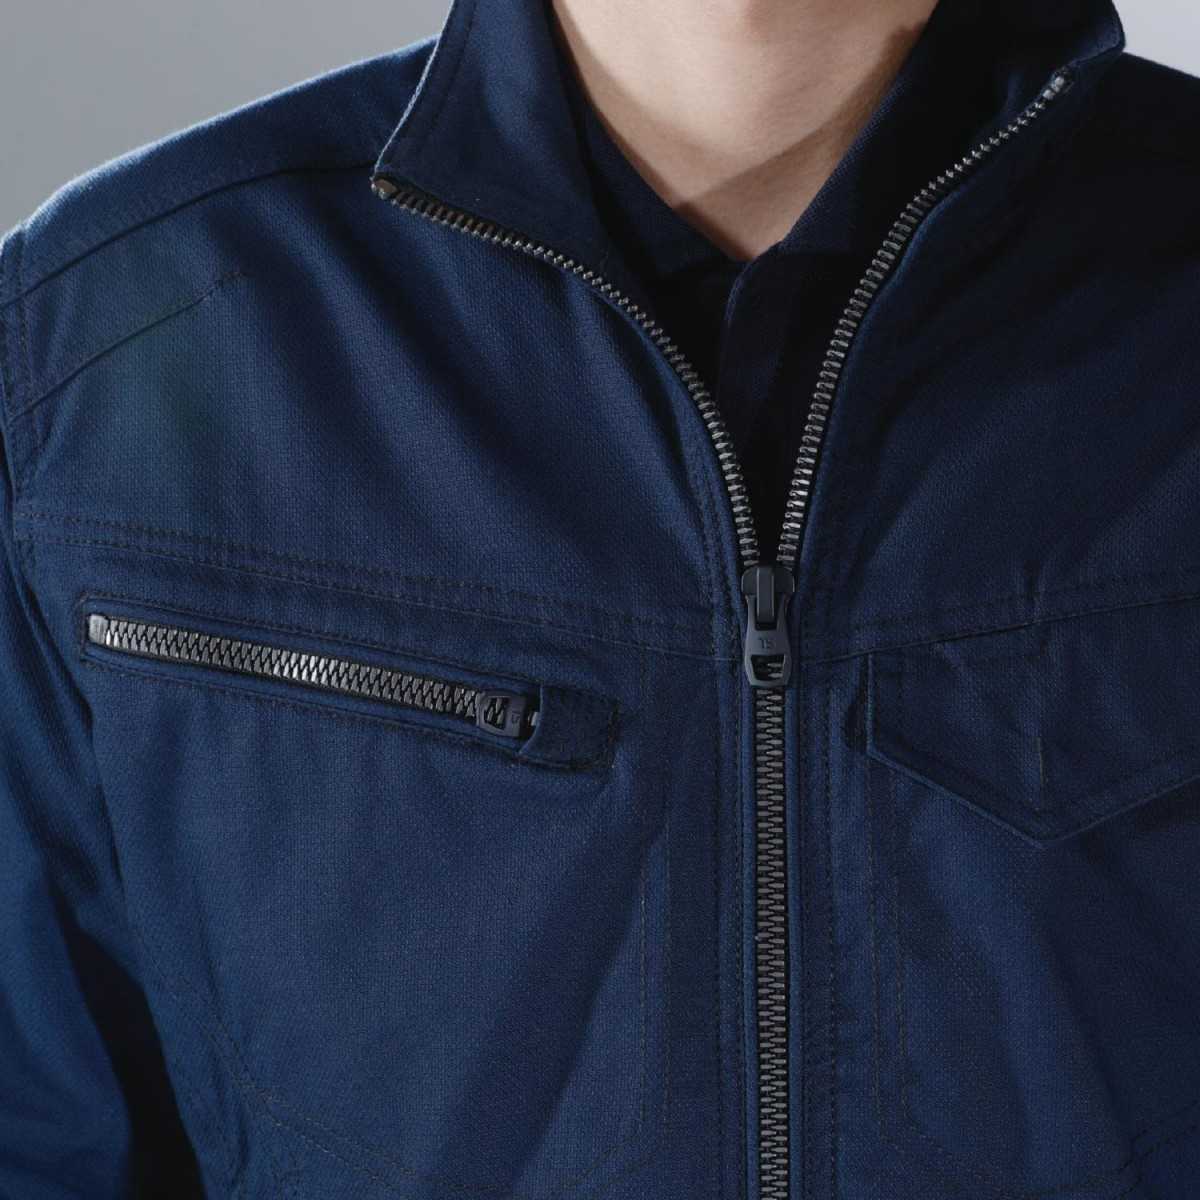 TS DESIGN 3516 ジャケット ¥5,280(税込)大型のファスナー採用。使い易さが違います。